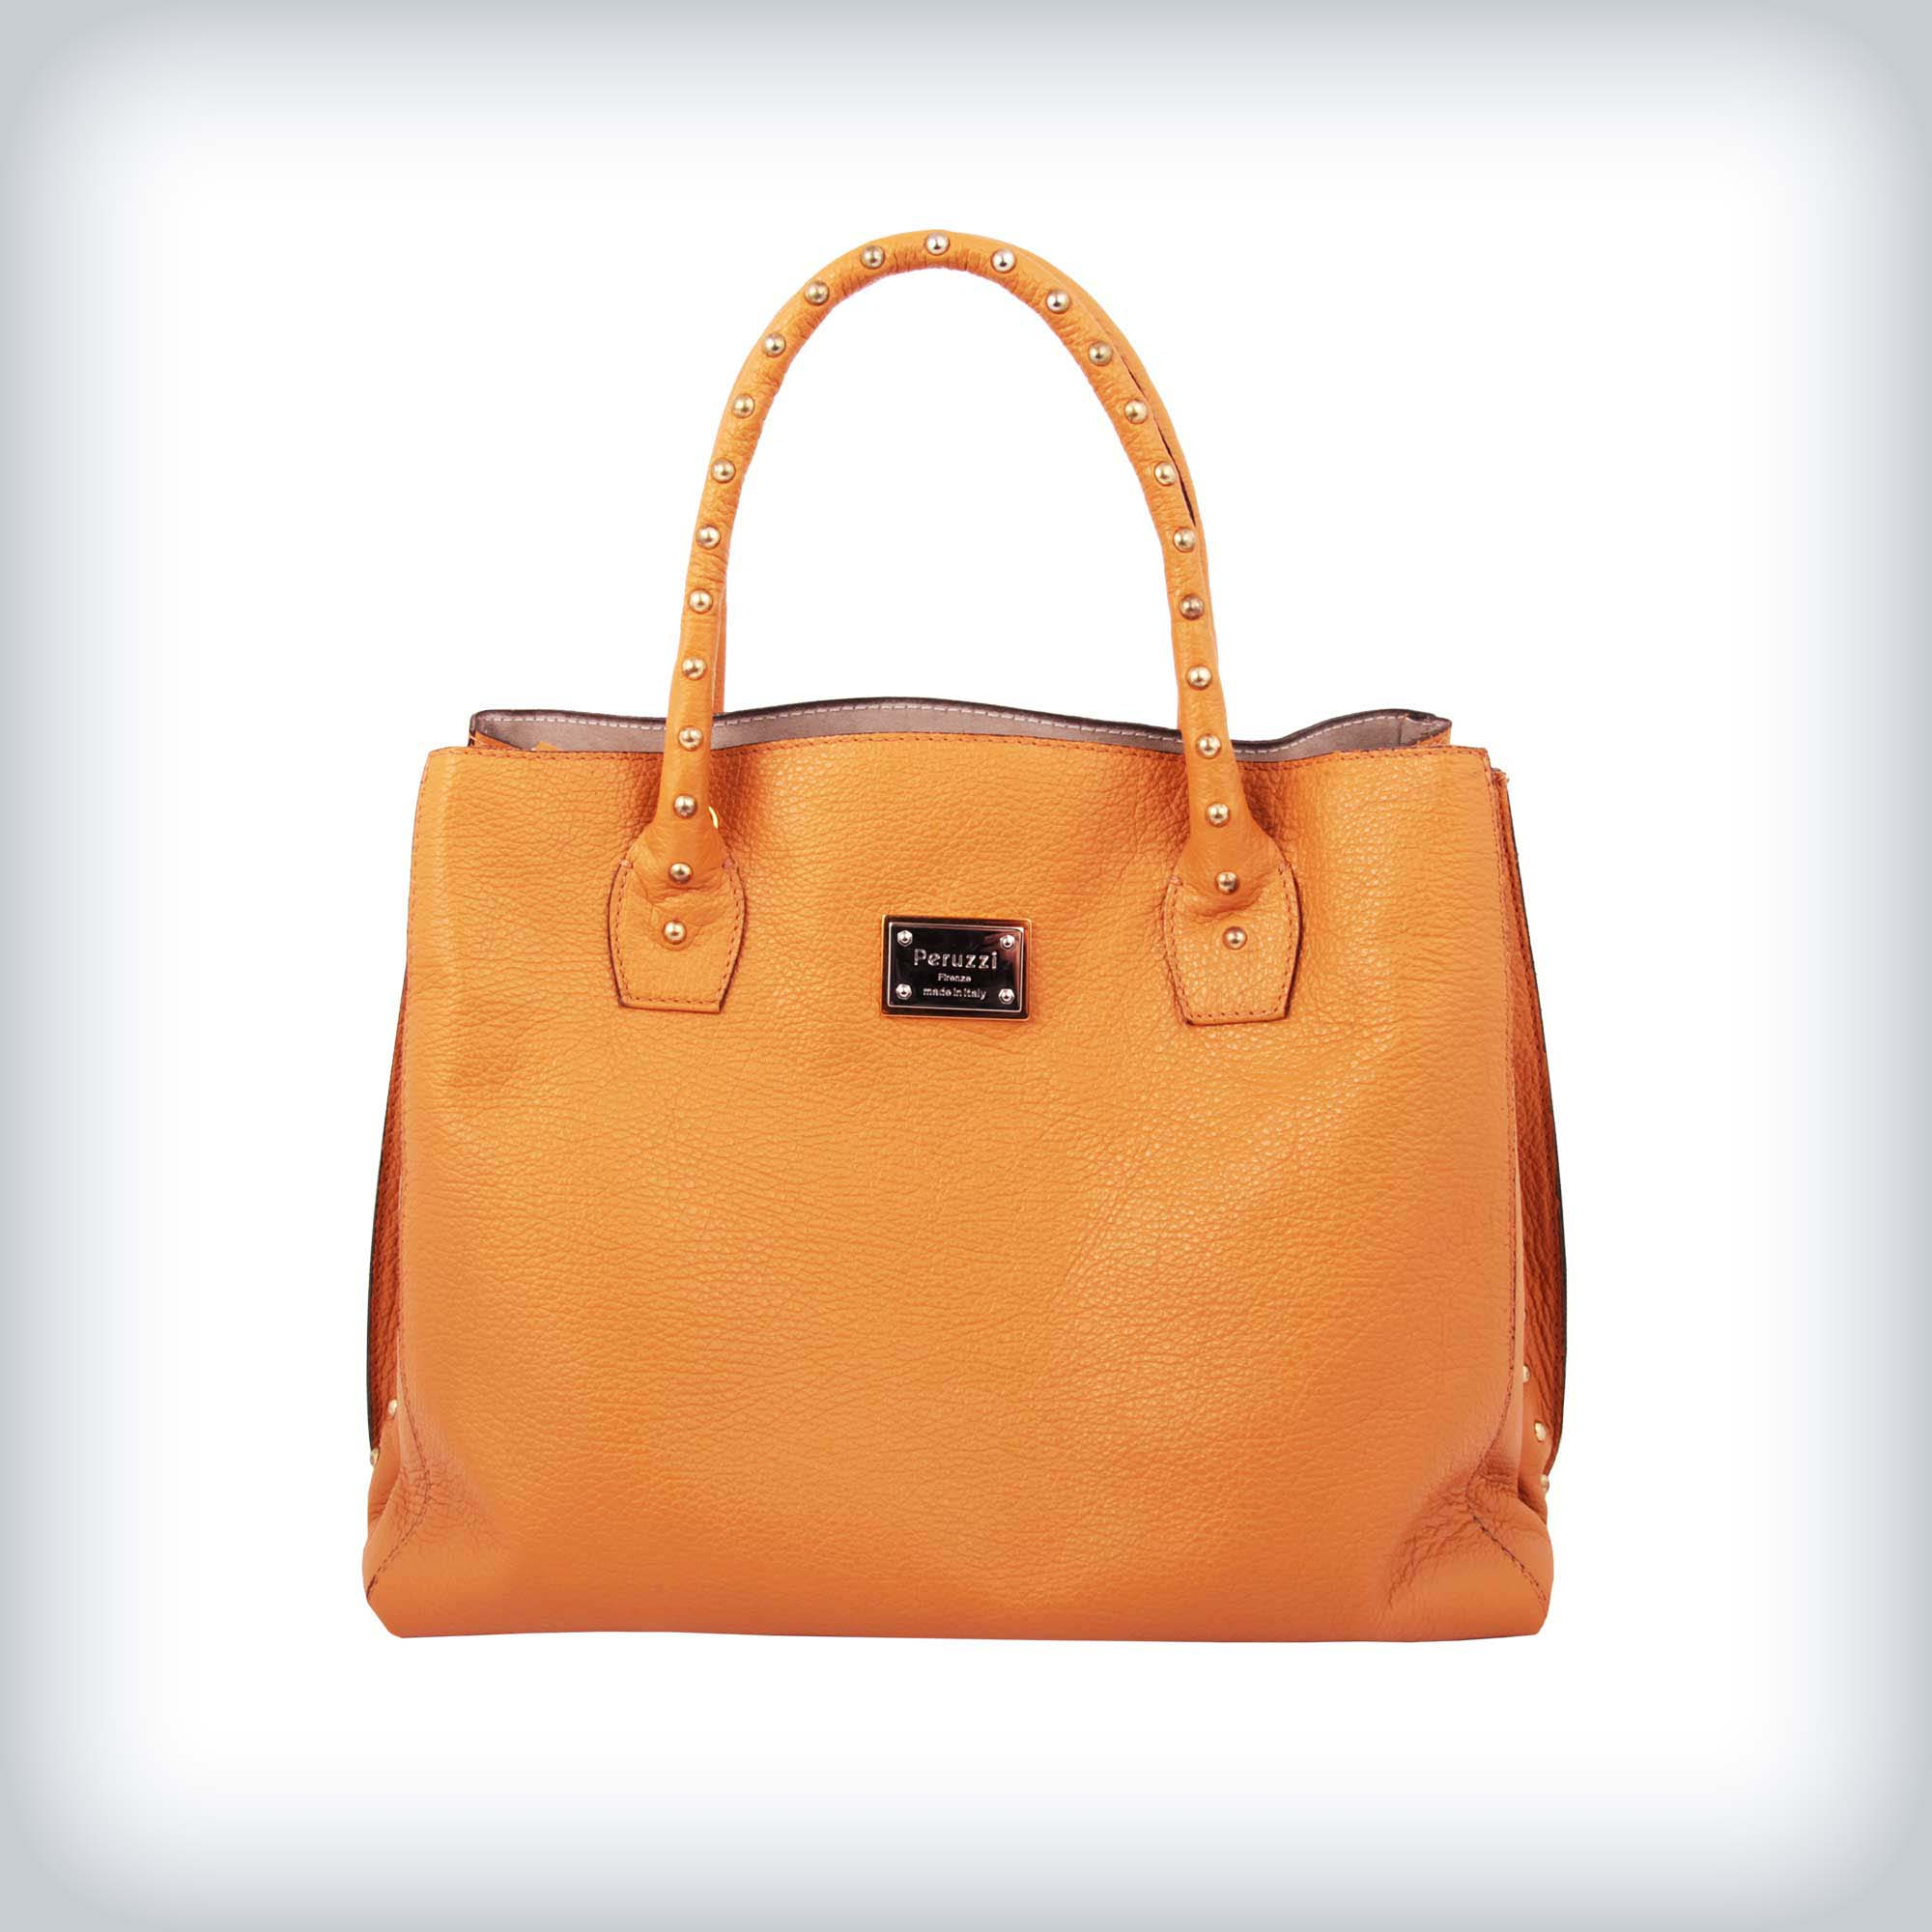 Soft Leather Handle Peruzzi